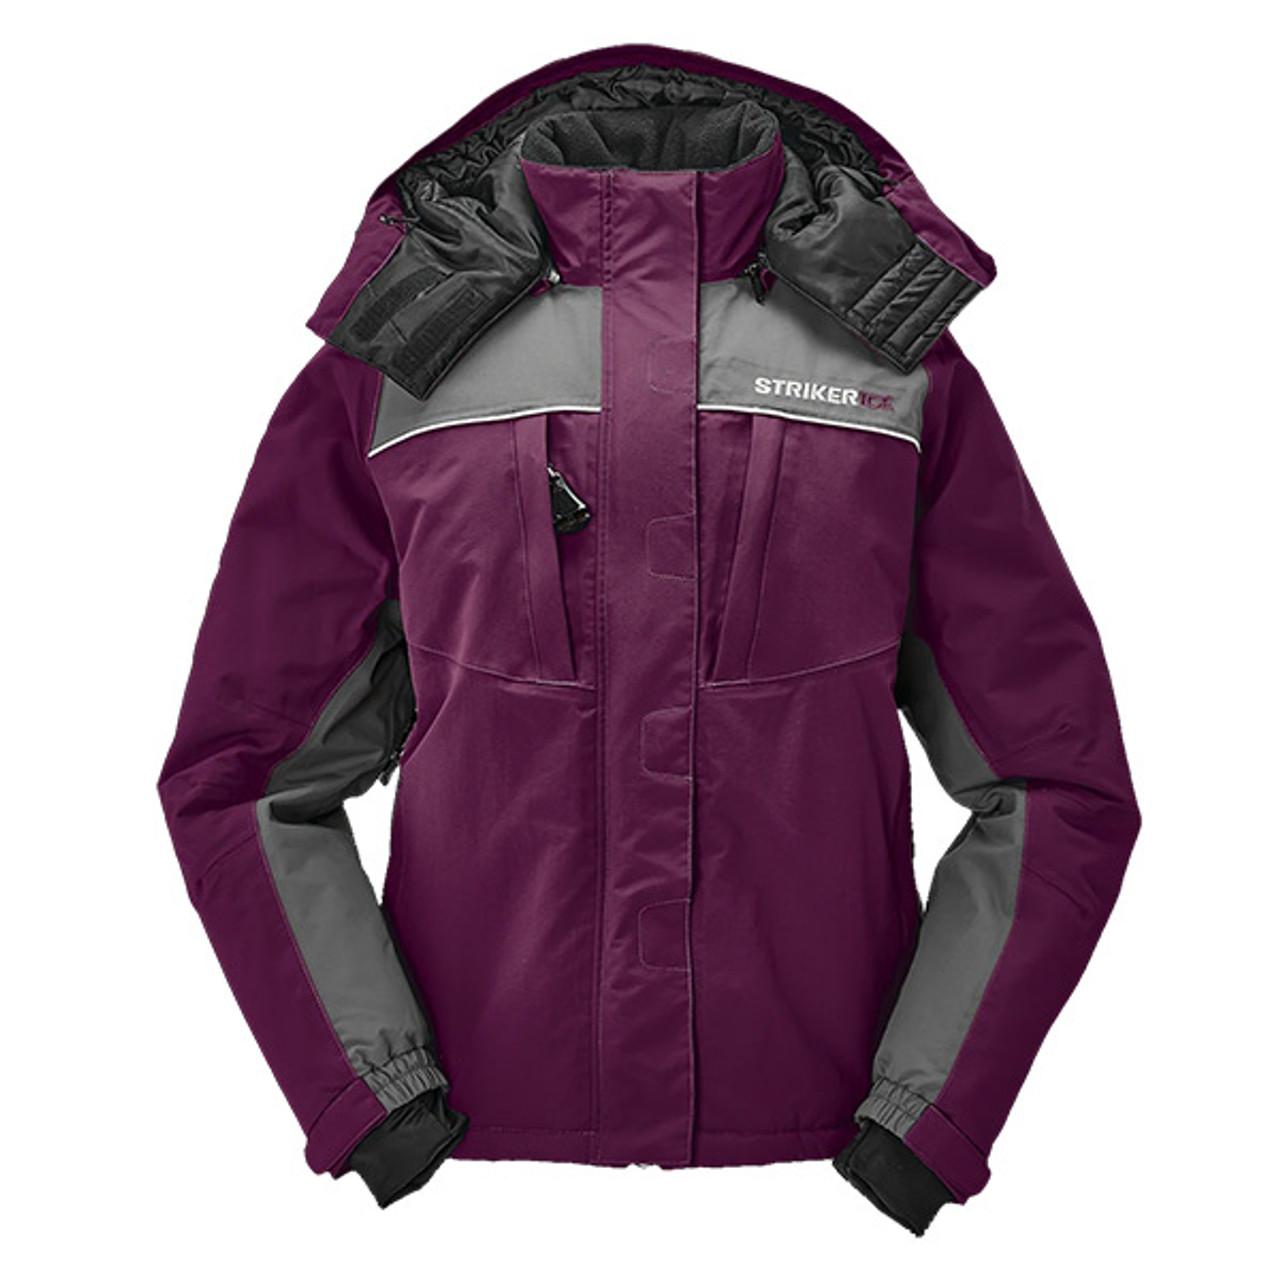 New 2020 Marsala/Gray Striker Ice Women's Floating Prism Jacket